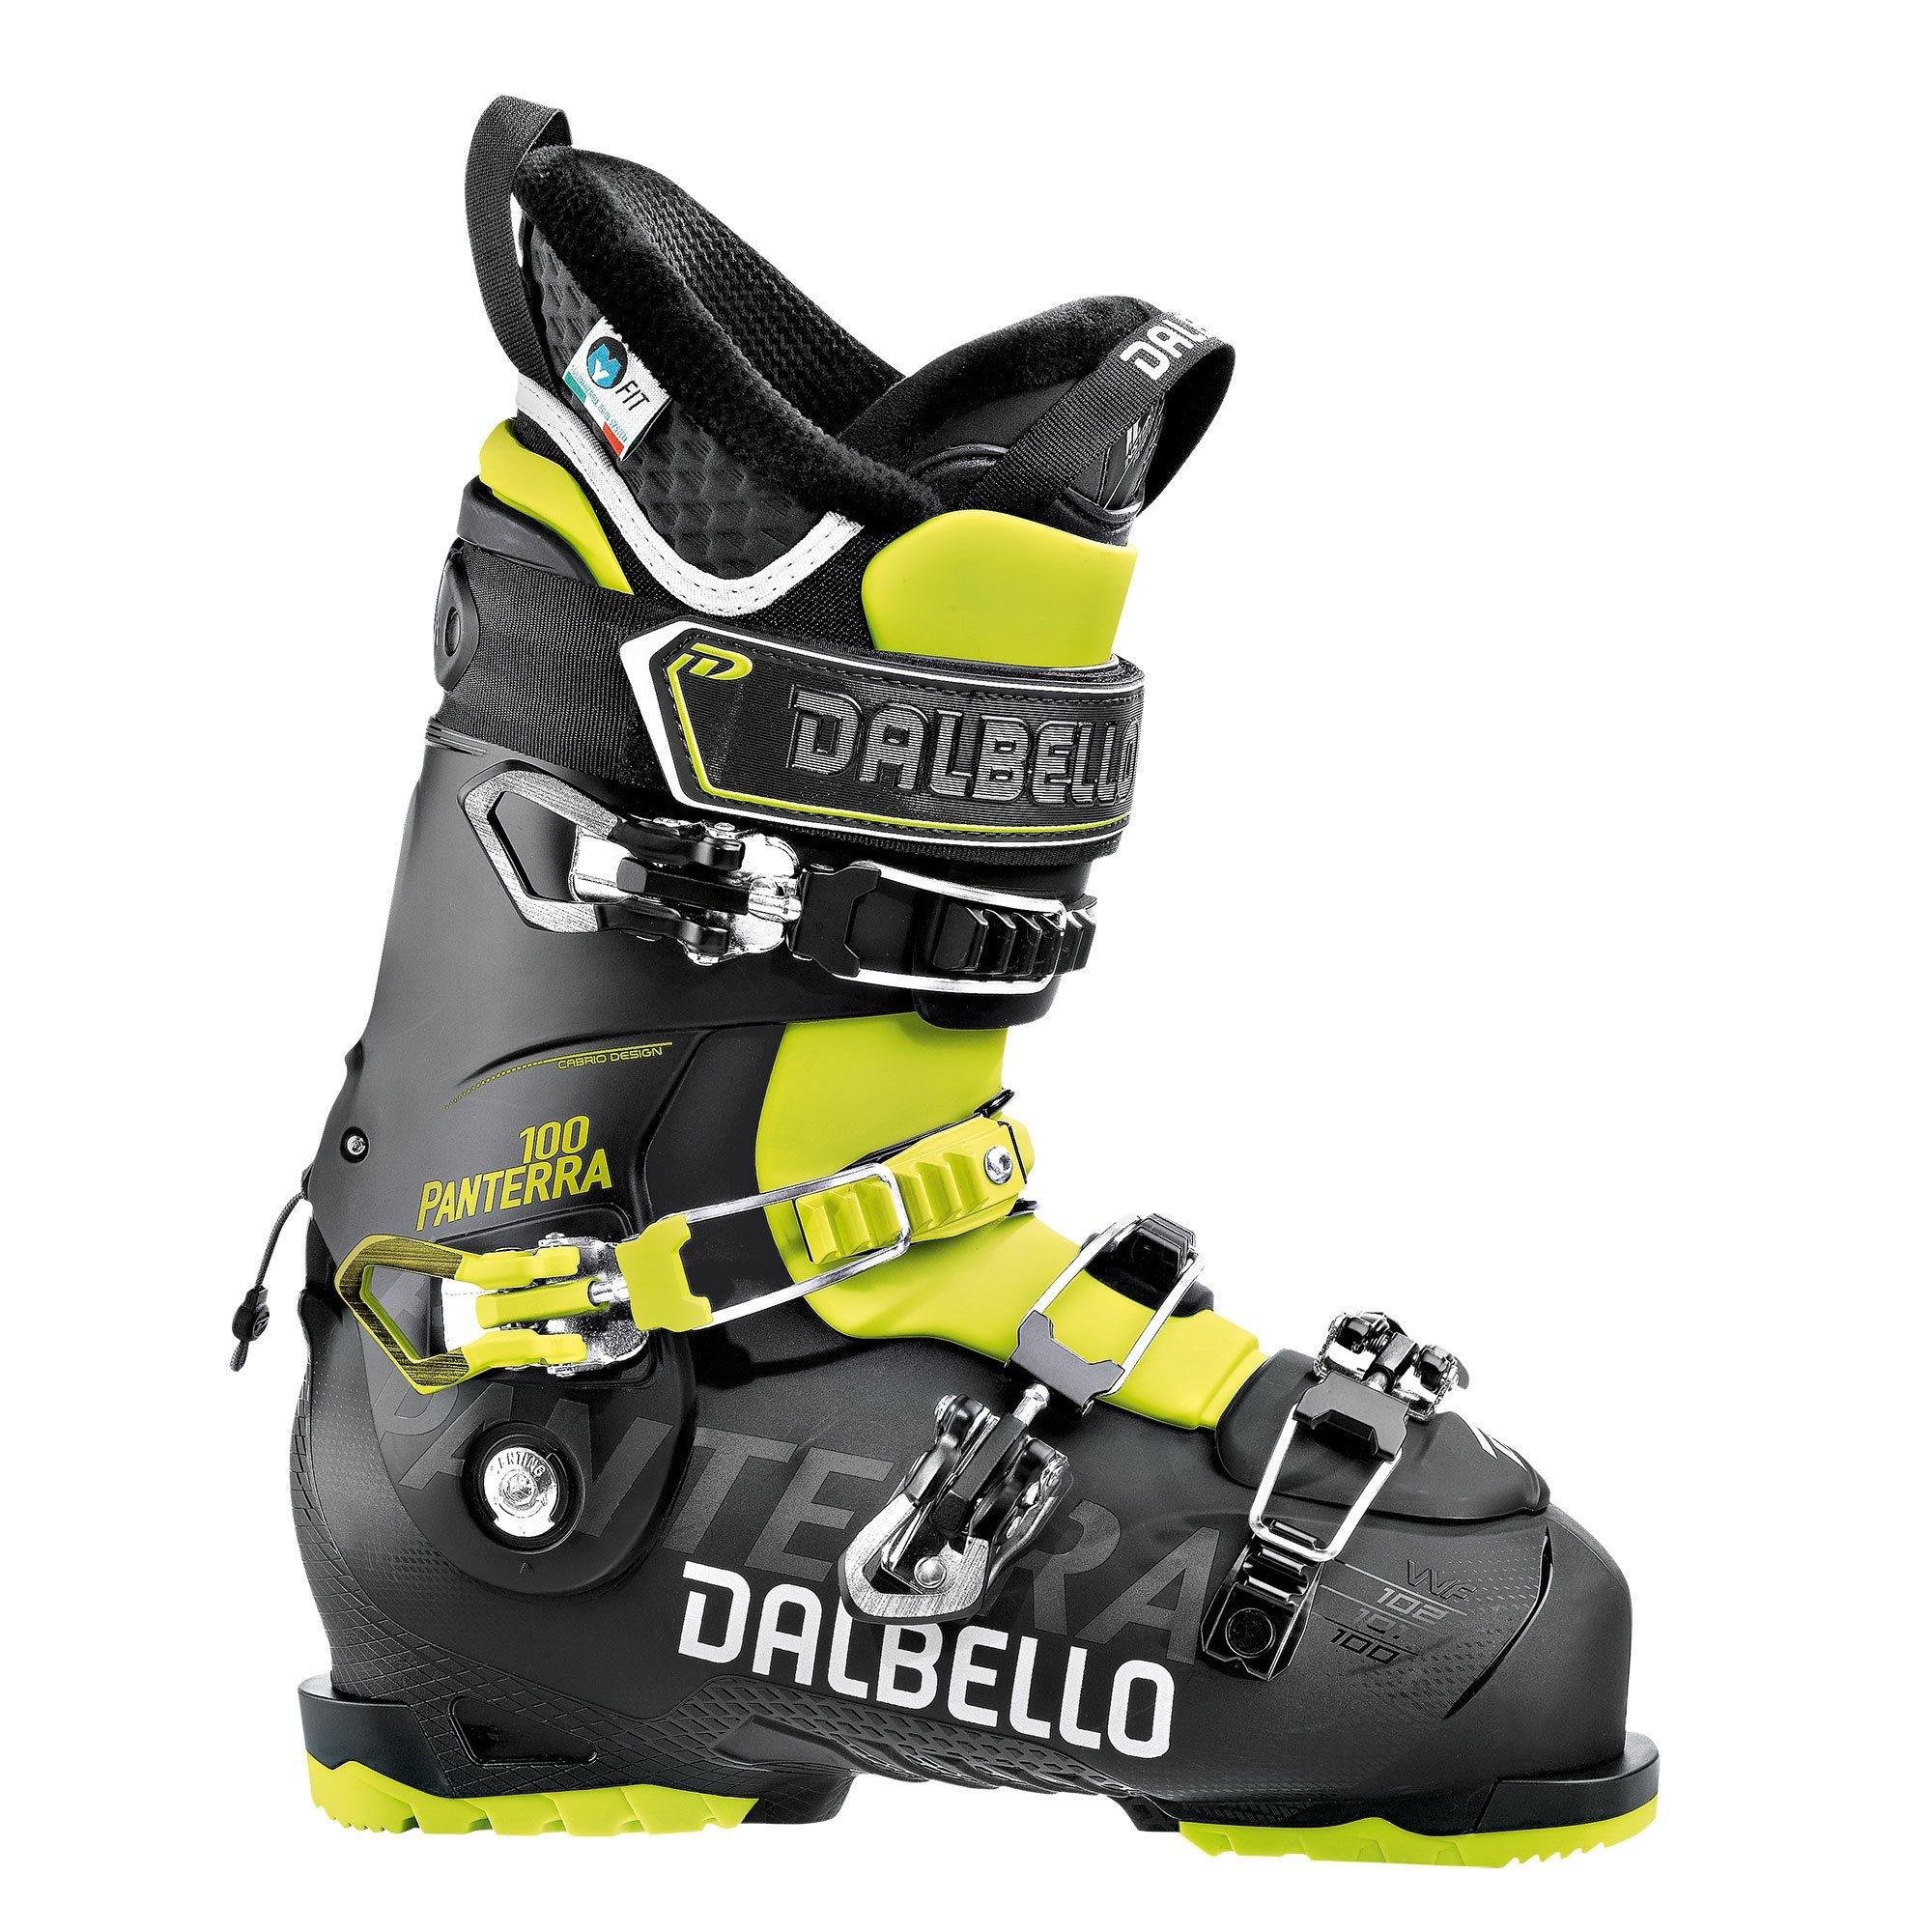 Dalbello Panterra 100 Ski Boot Black/Acid Yellow 2018